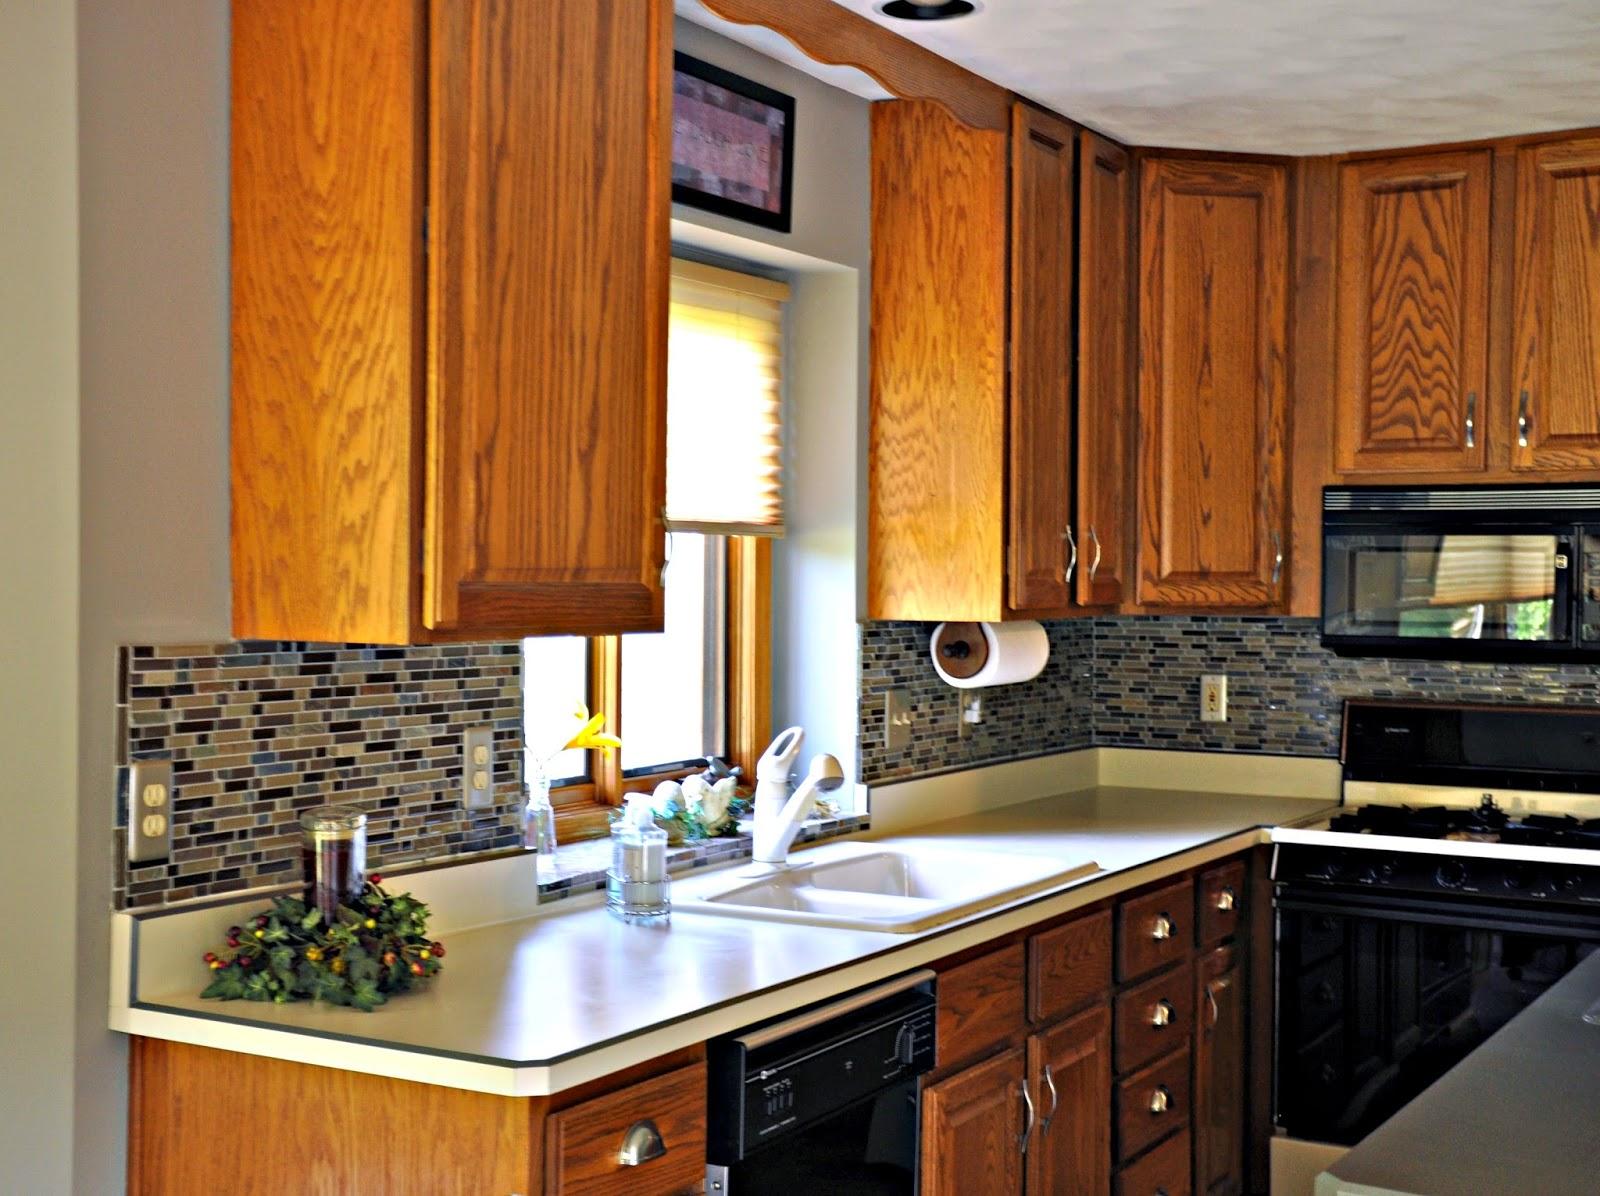 diy updates glass mosaic tile kitchen installing kitchen backsplash DIY Updates Glass Mosaic Tile Kitchen Backsplash and Marble Tile Fireplace Surround